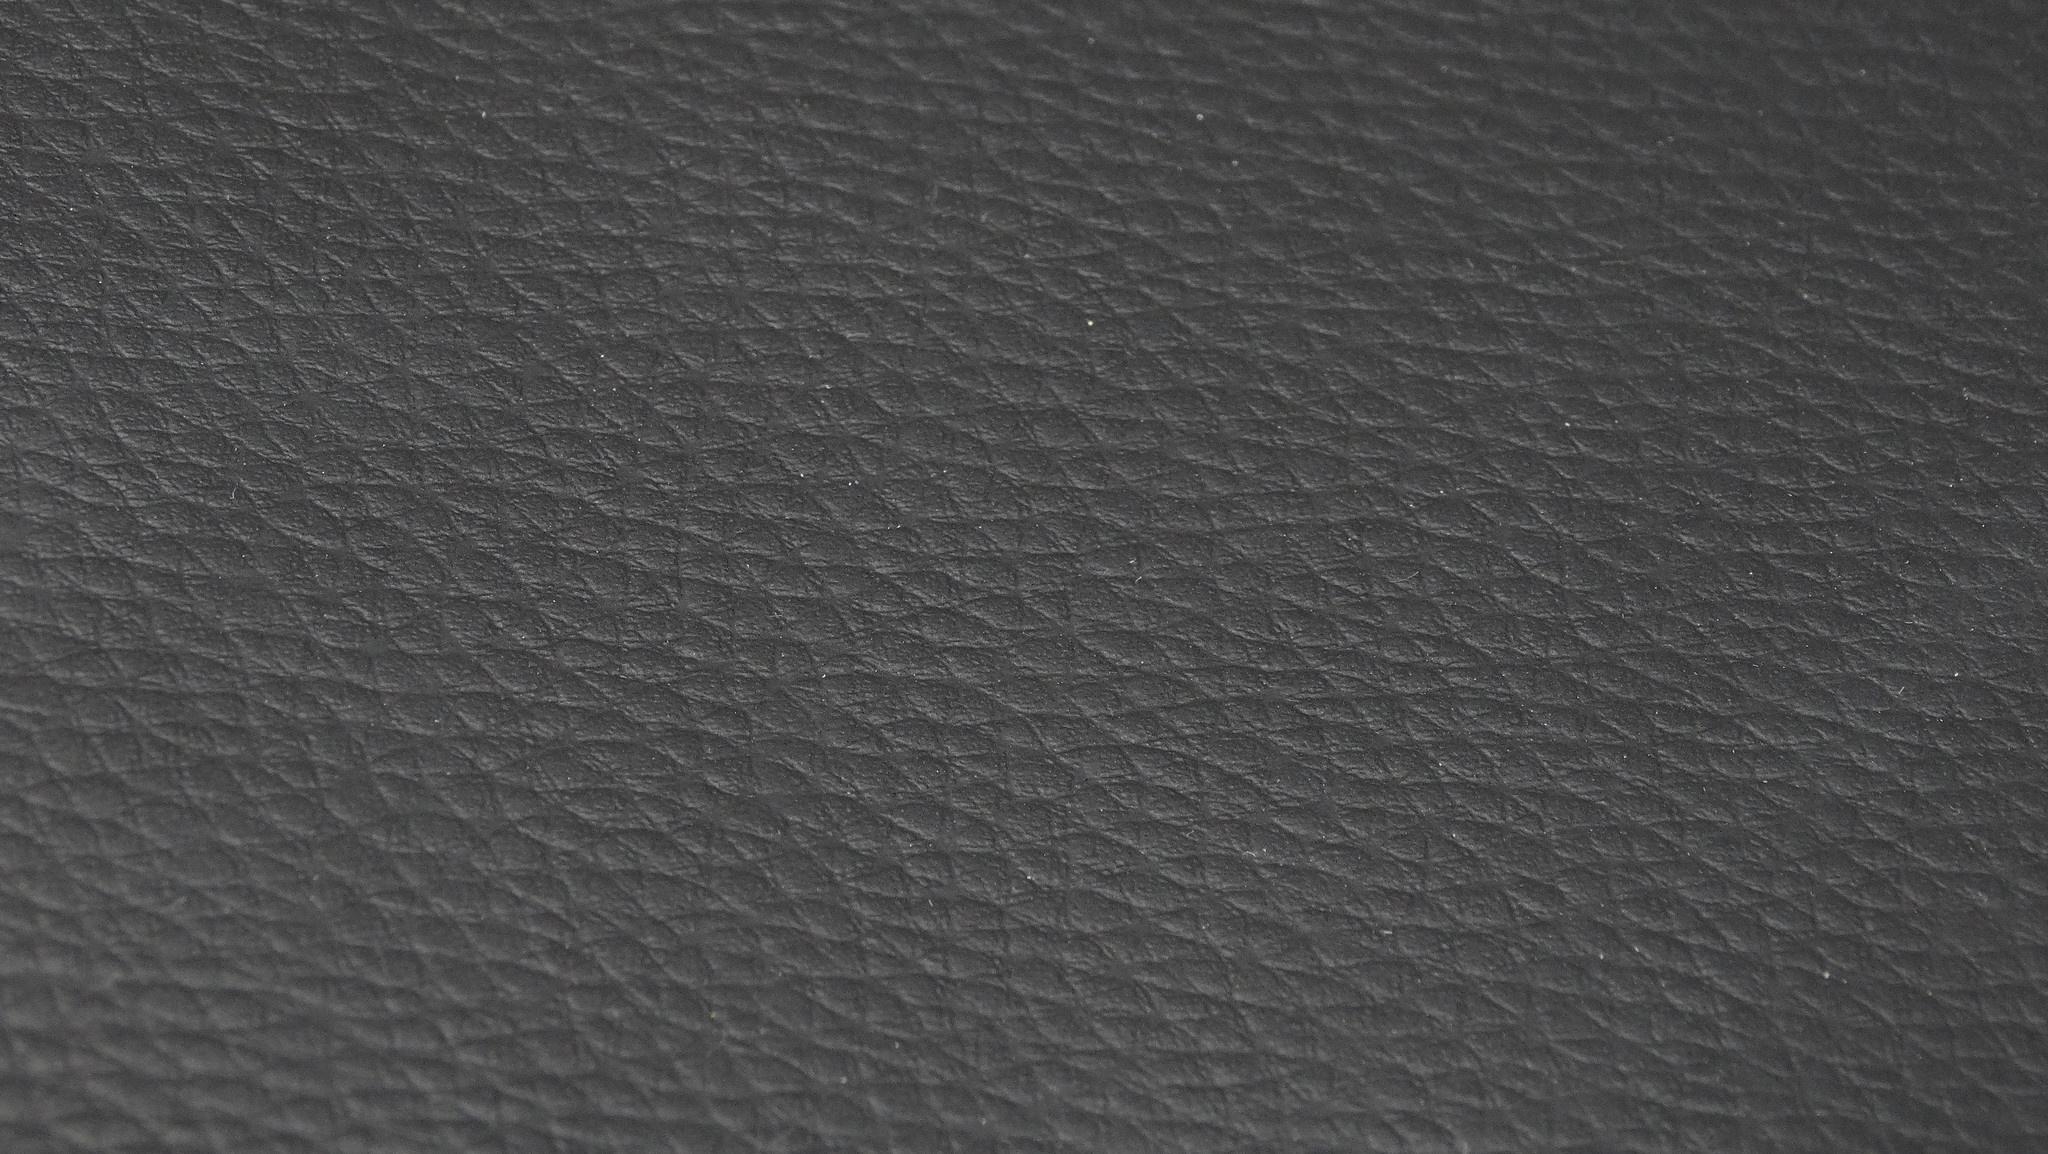 Hundos  Benchkussen maat XL 116x77x6 cm.